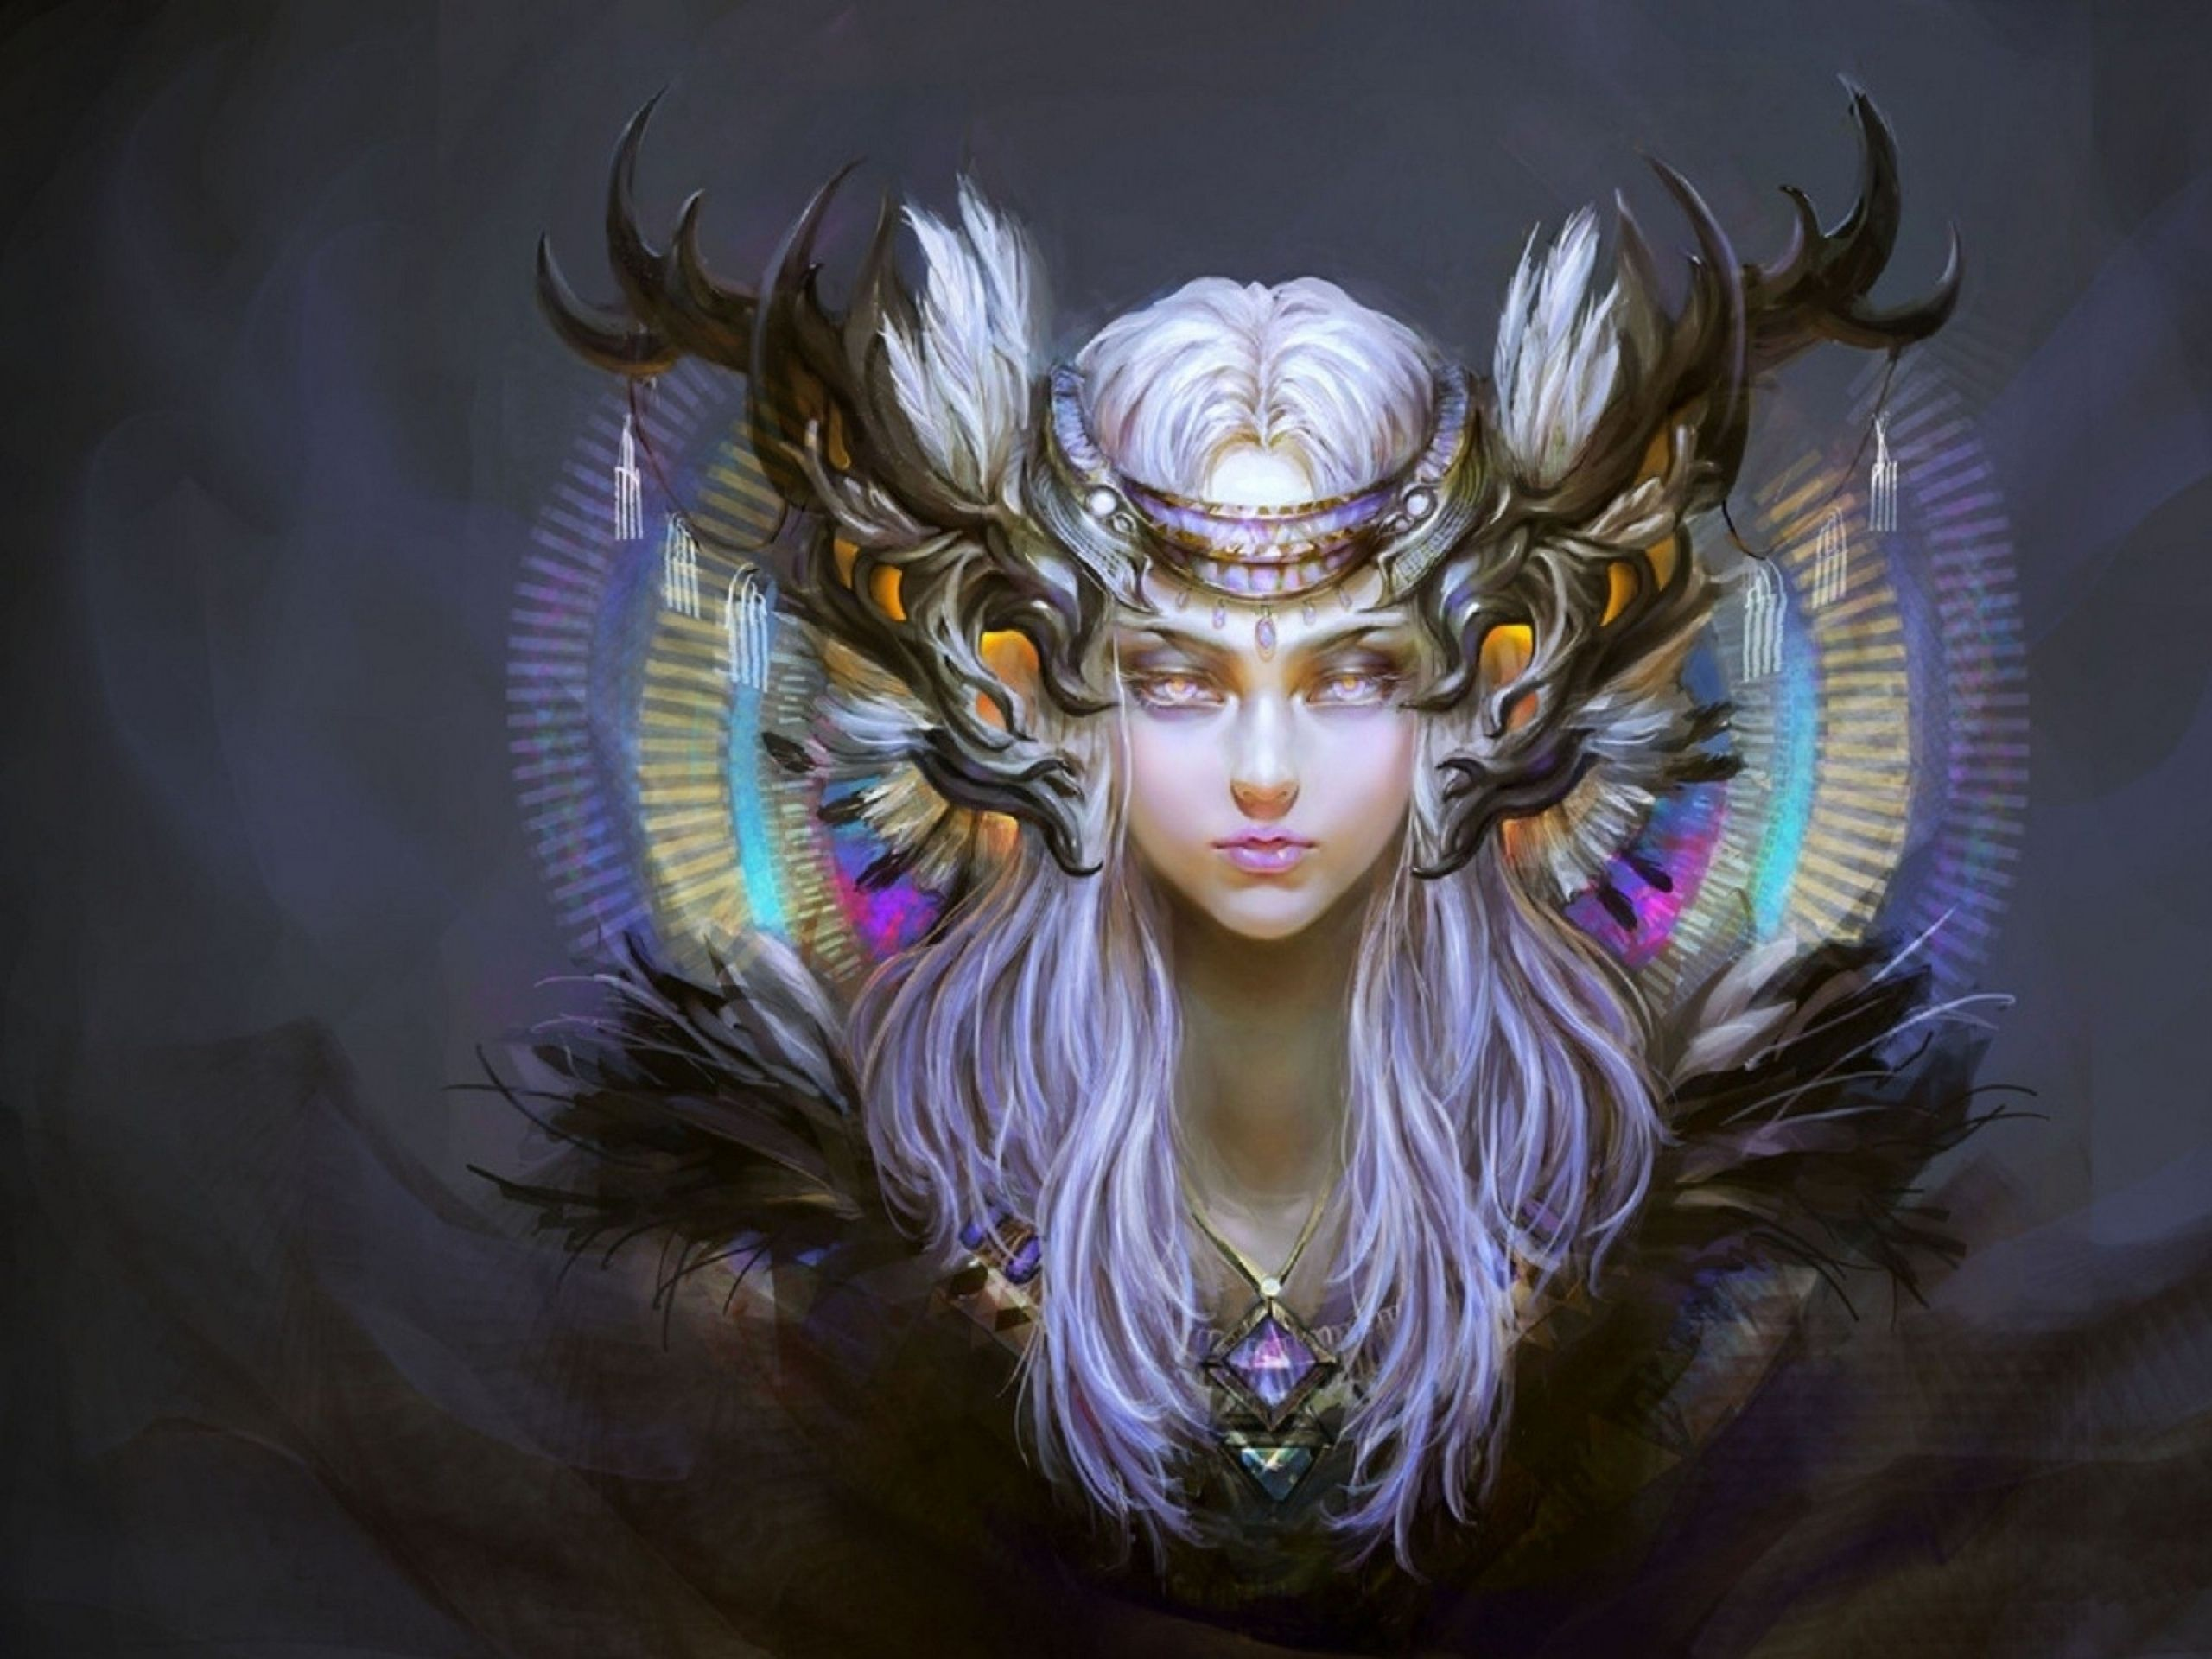 Fantasy art women hartshorn hd wallpapers revieu